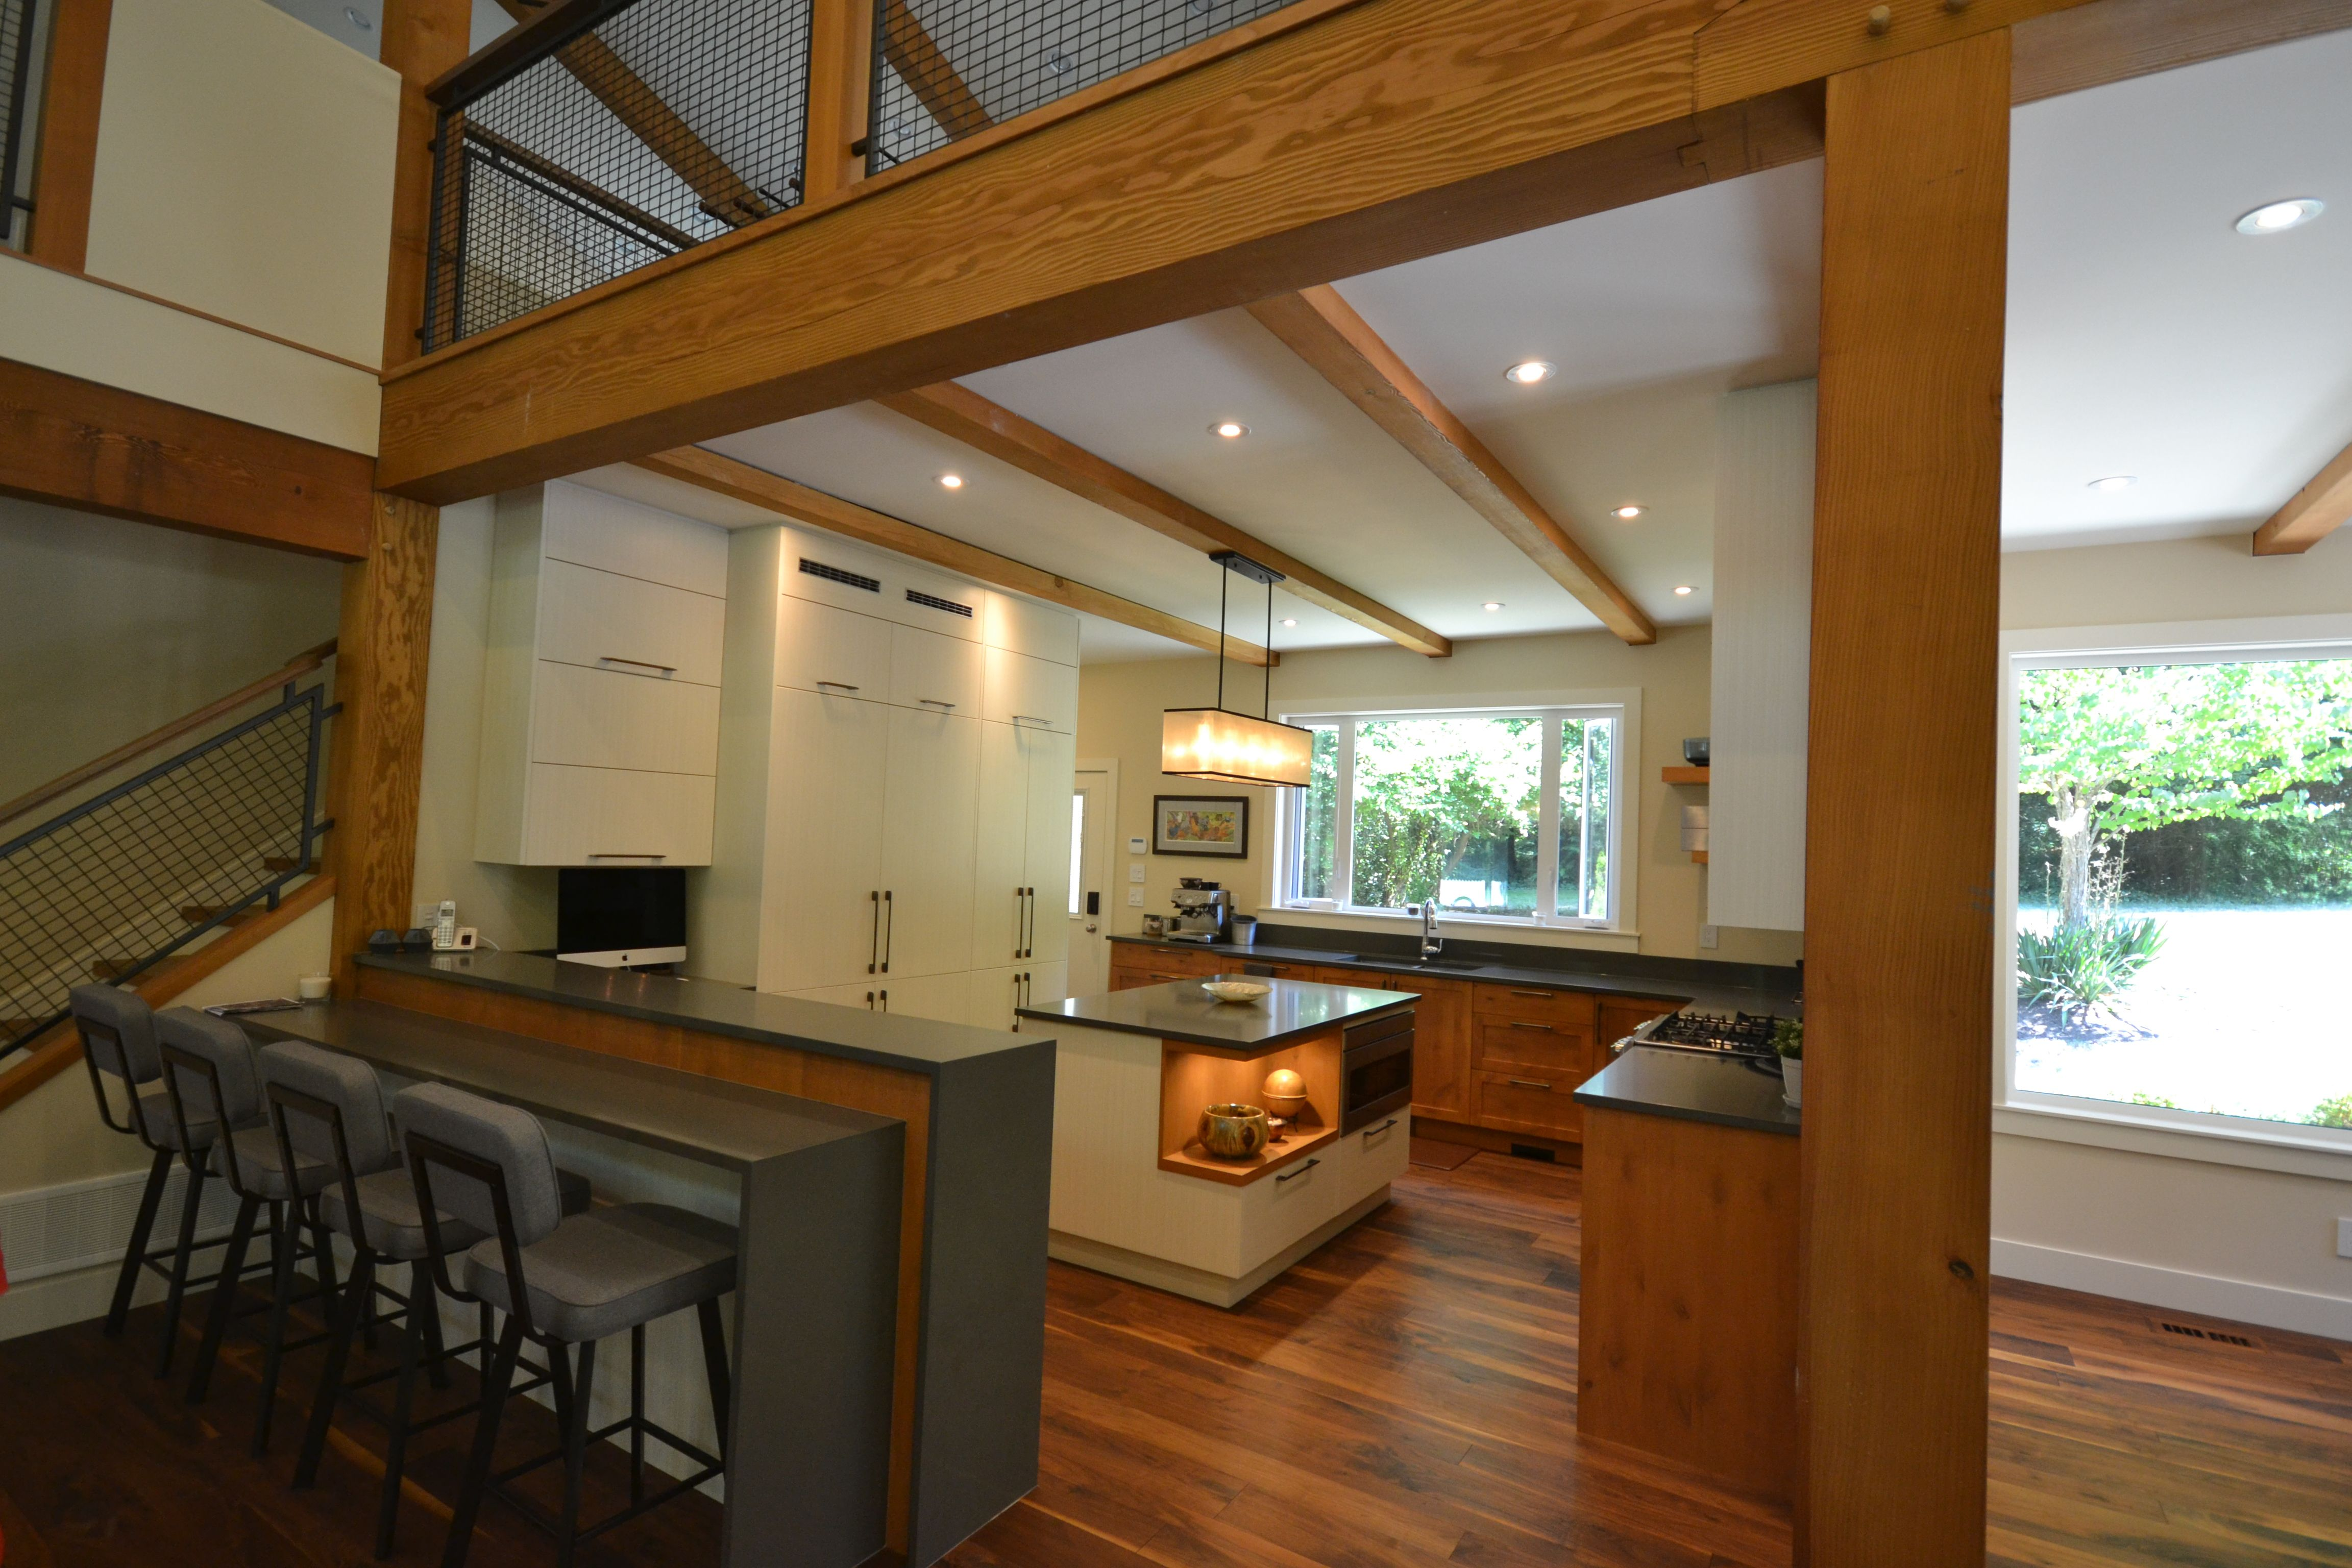 Tamlin International Homes Ltd Gallery Project Photos Timber Frame Porch Prefab Homes Home